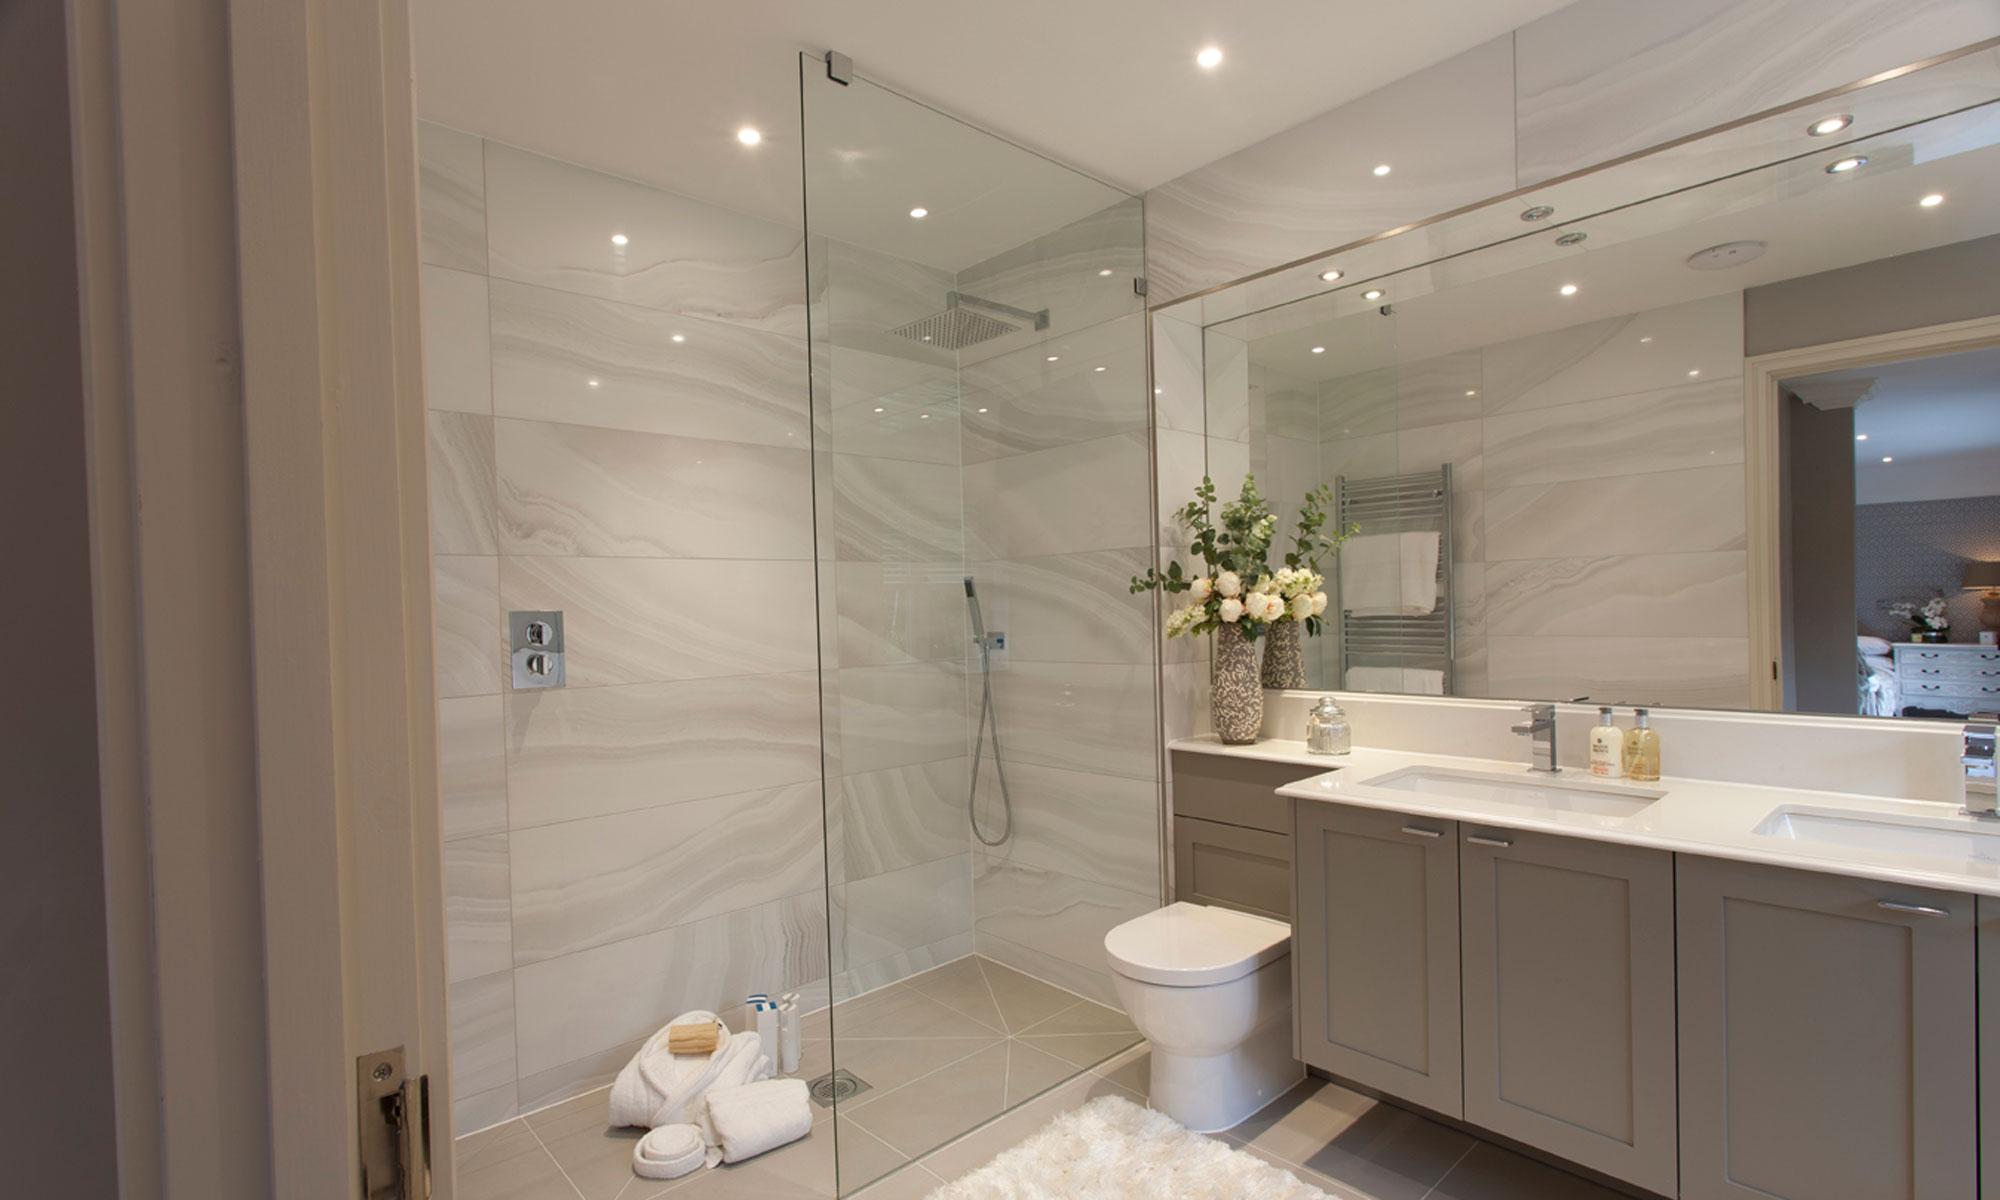 bespoke-shower-enclosures-carousel-2